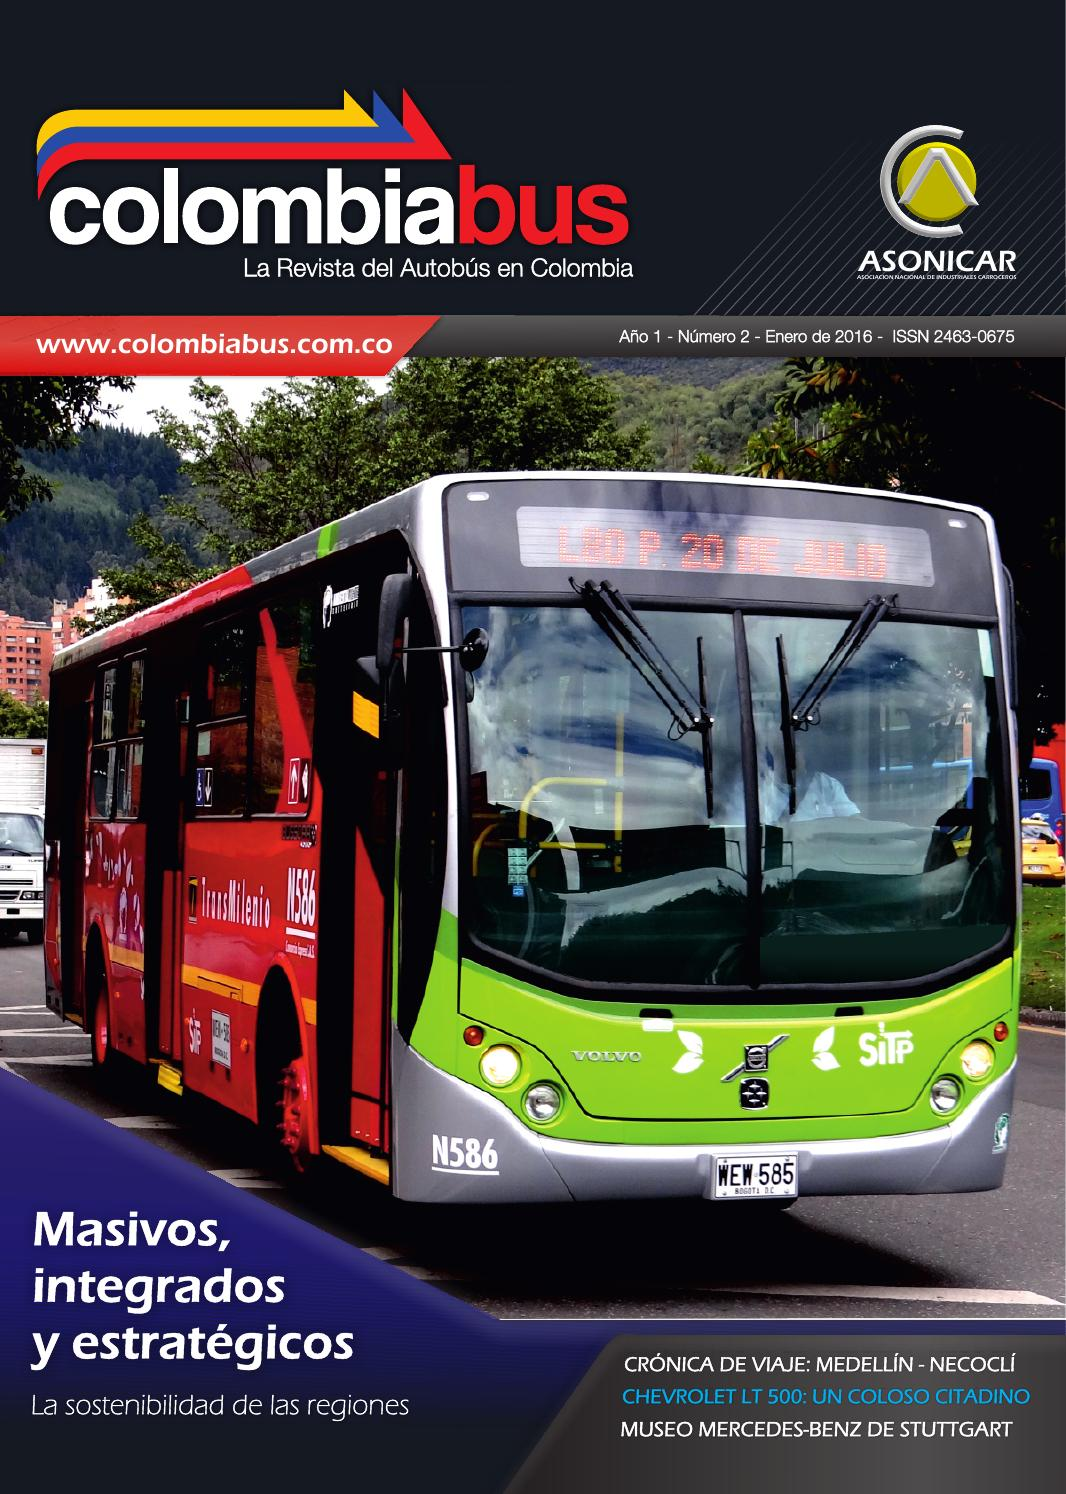 Revista Colombiabus enero 2016 - Ed. 2 by Colombiabus - issuu